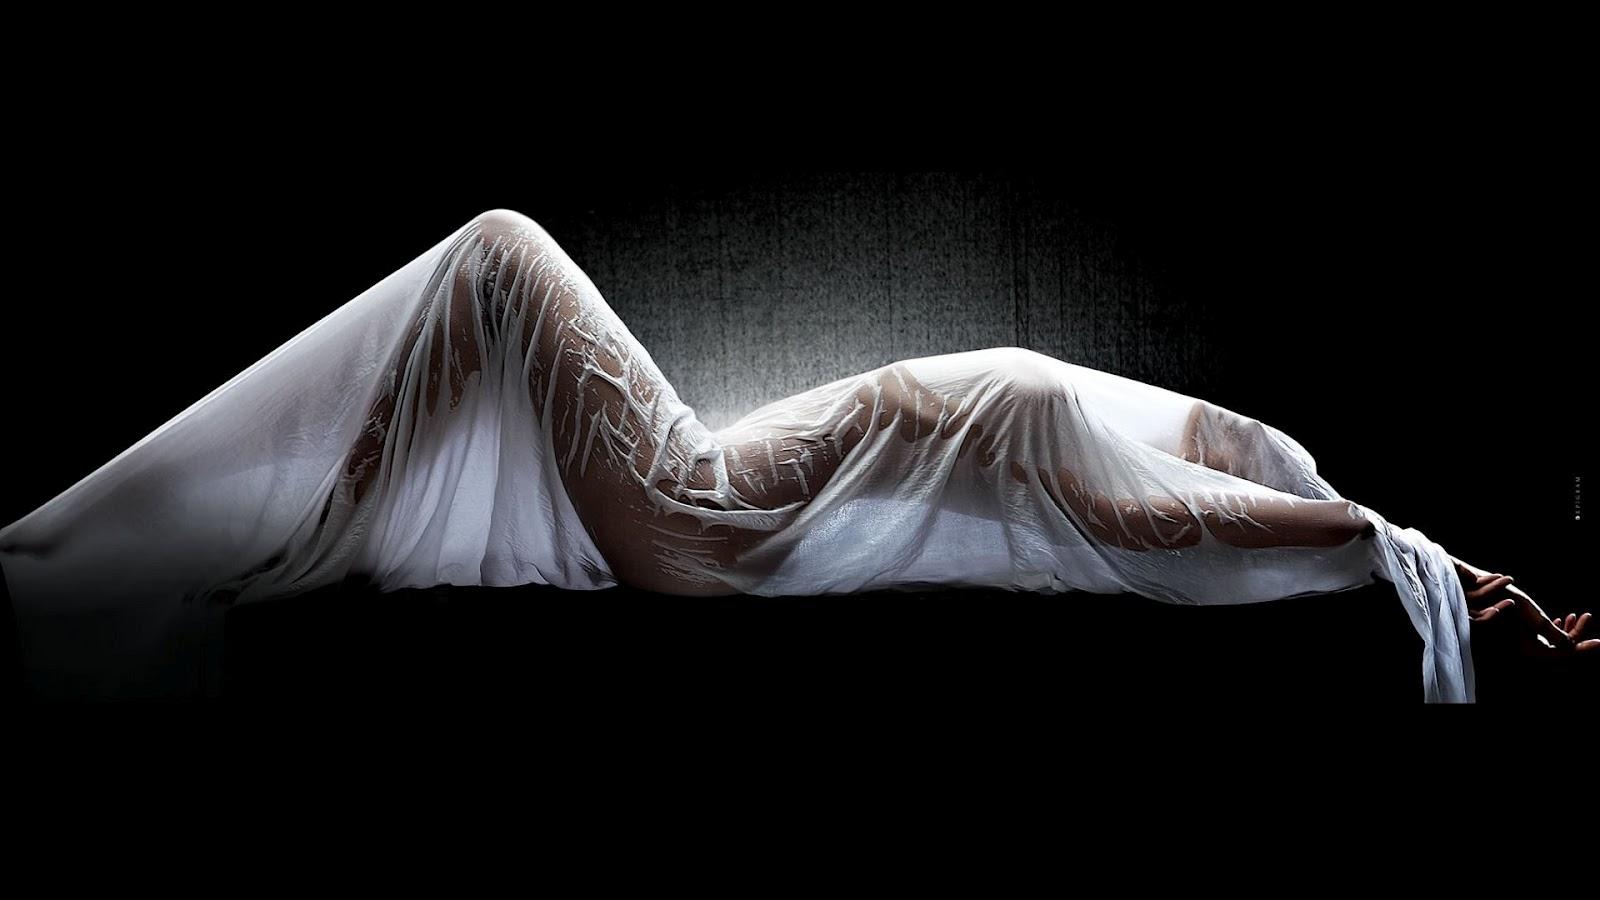 White curtain wallpaper - Wet White Curtain Wallpaper